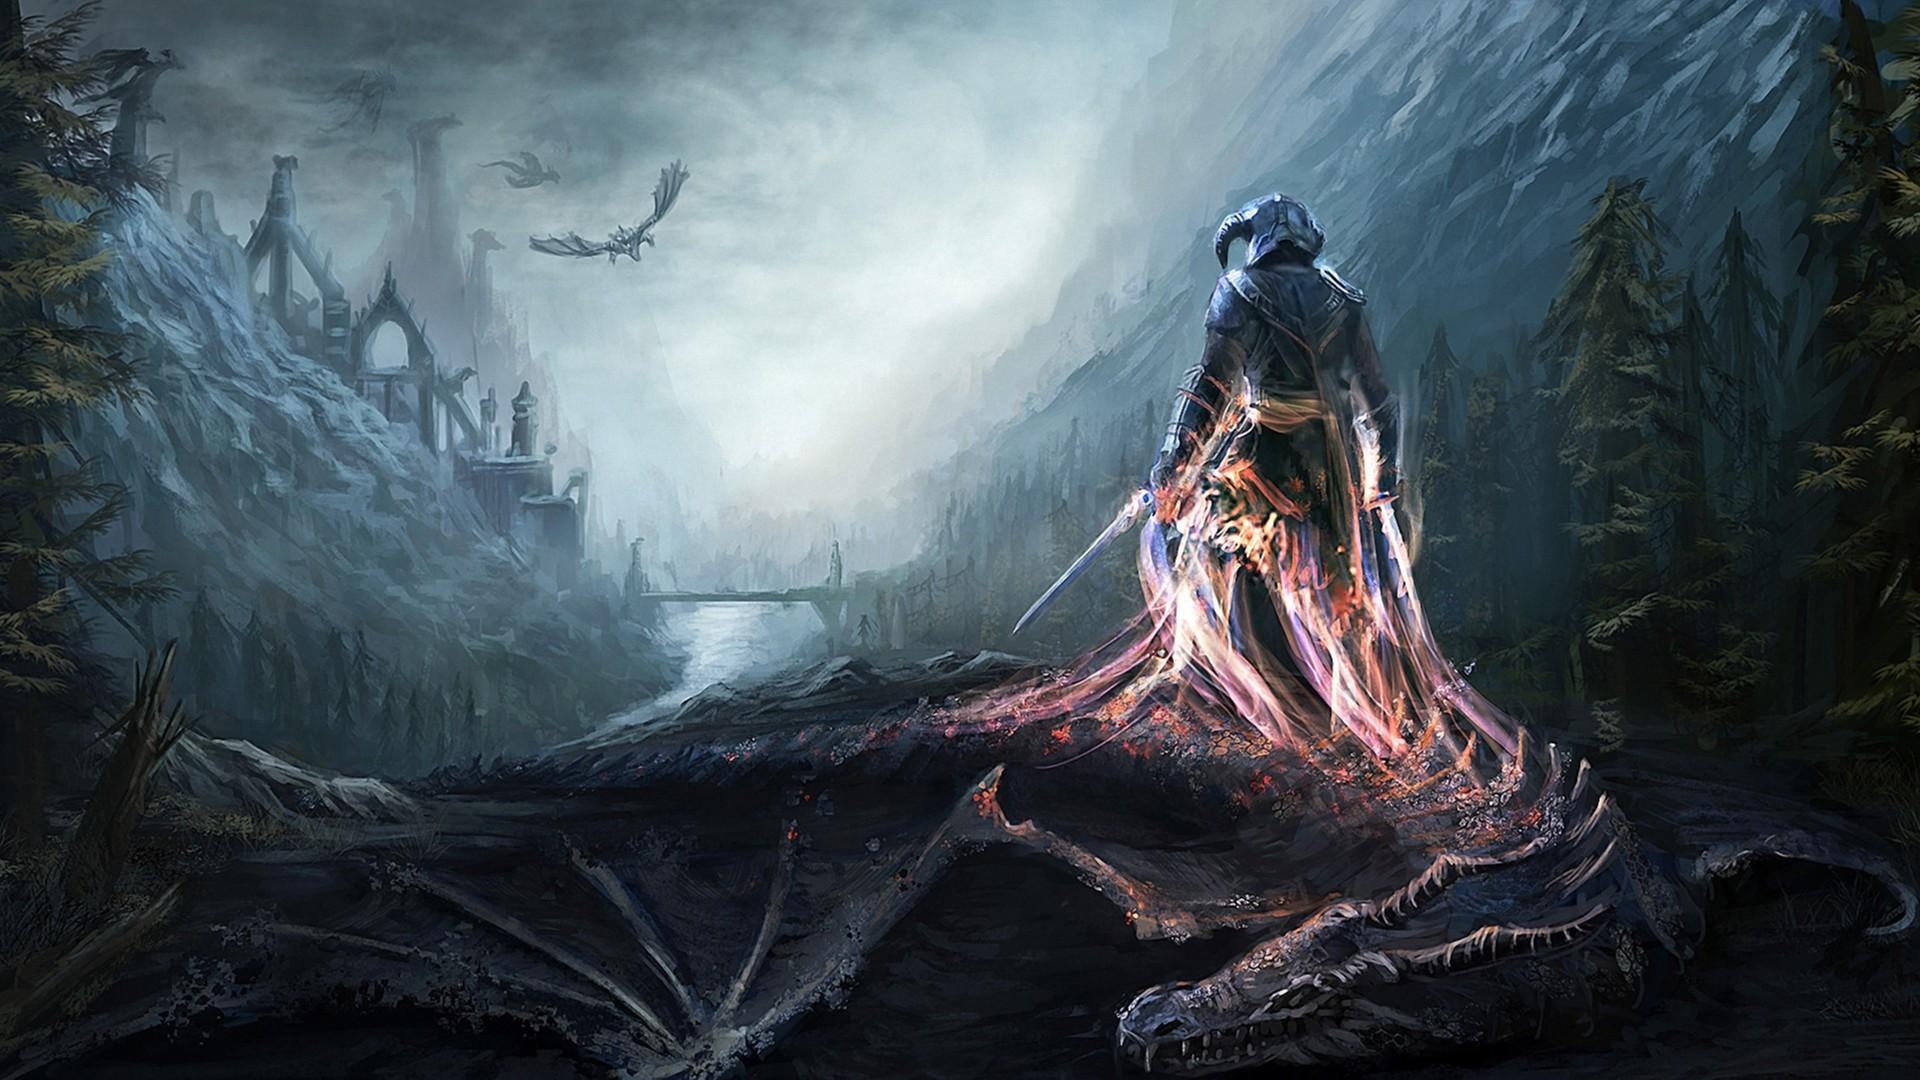 Skyrim Dragon Wallpaper